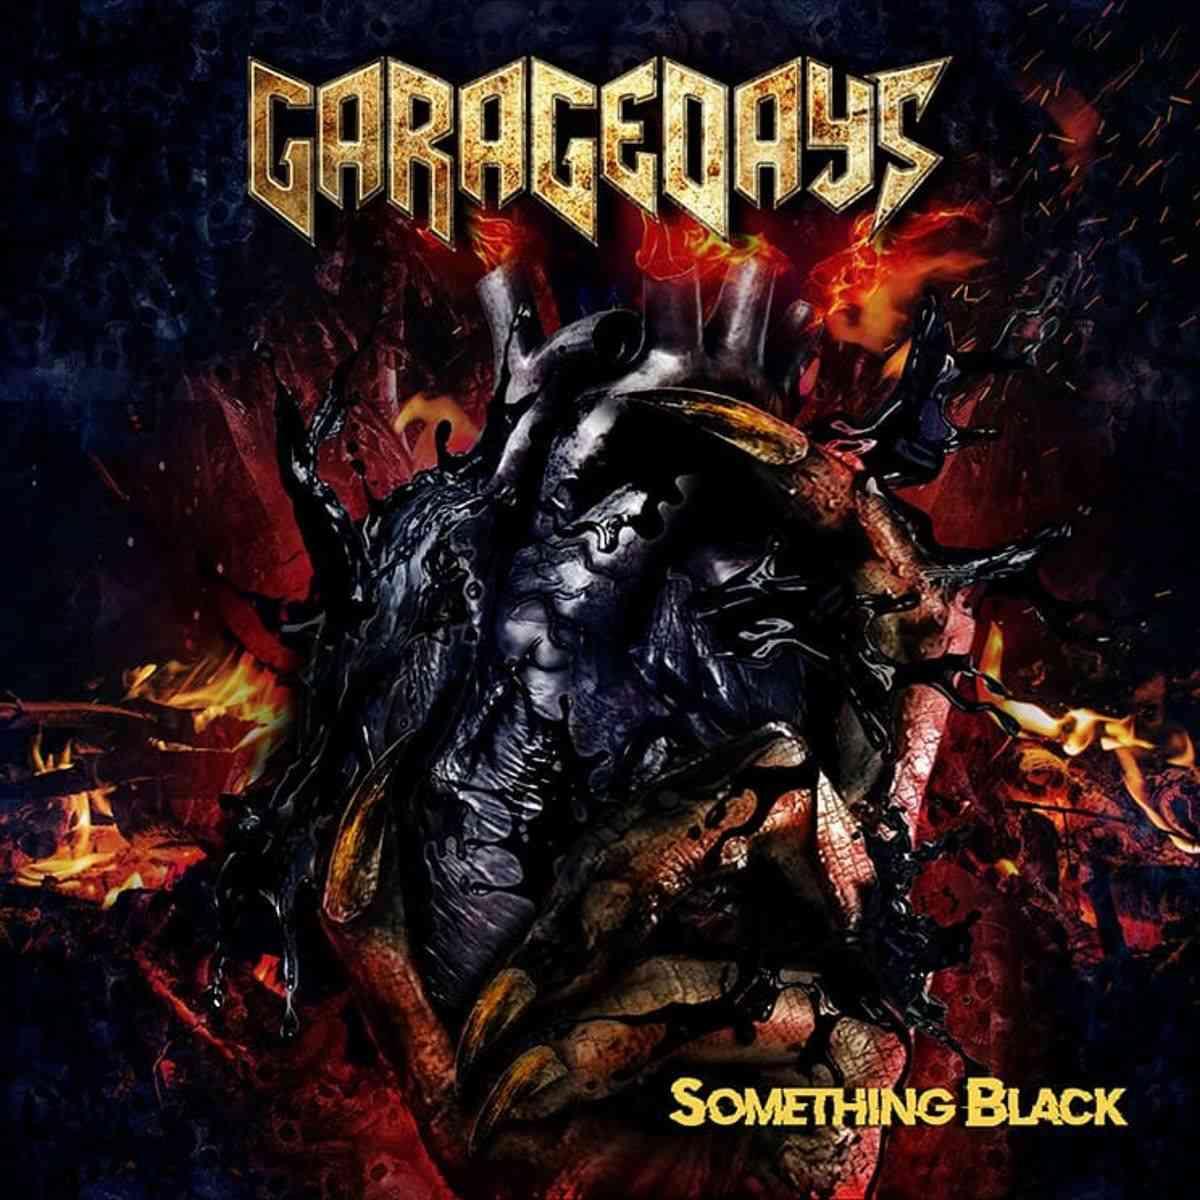 garagedays - something black - album cover